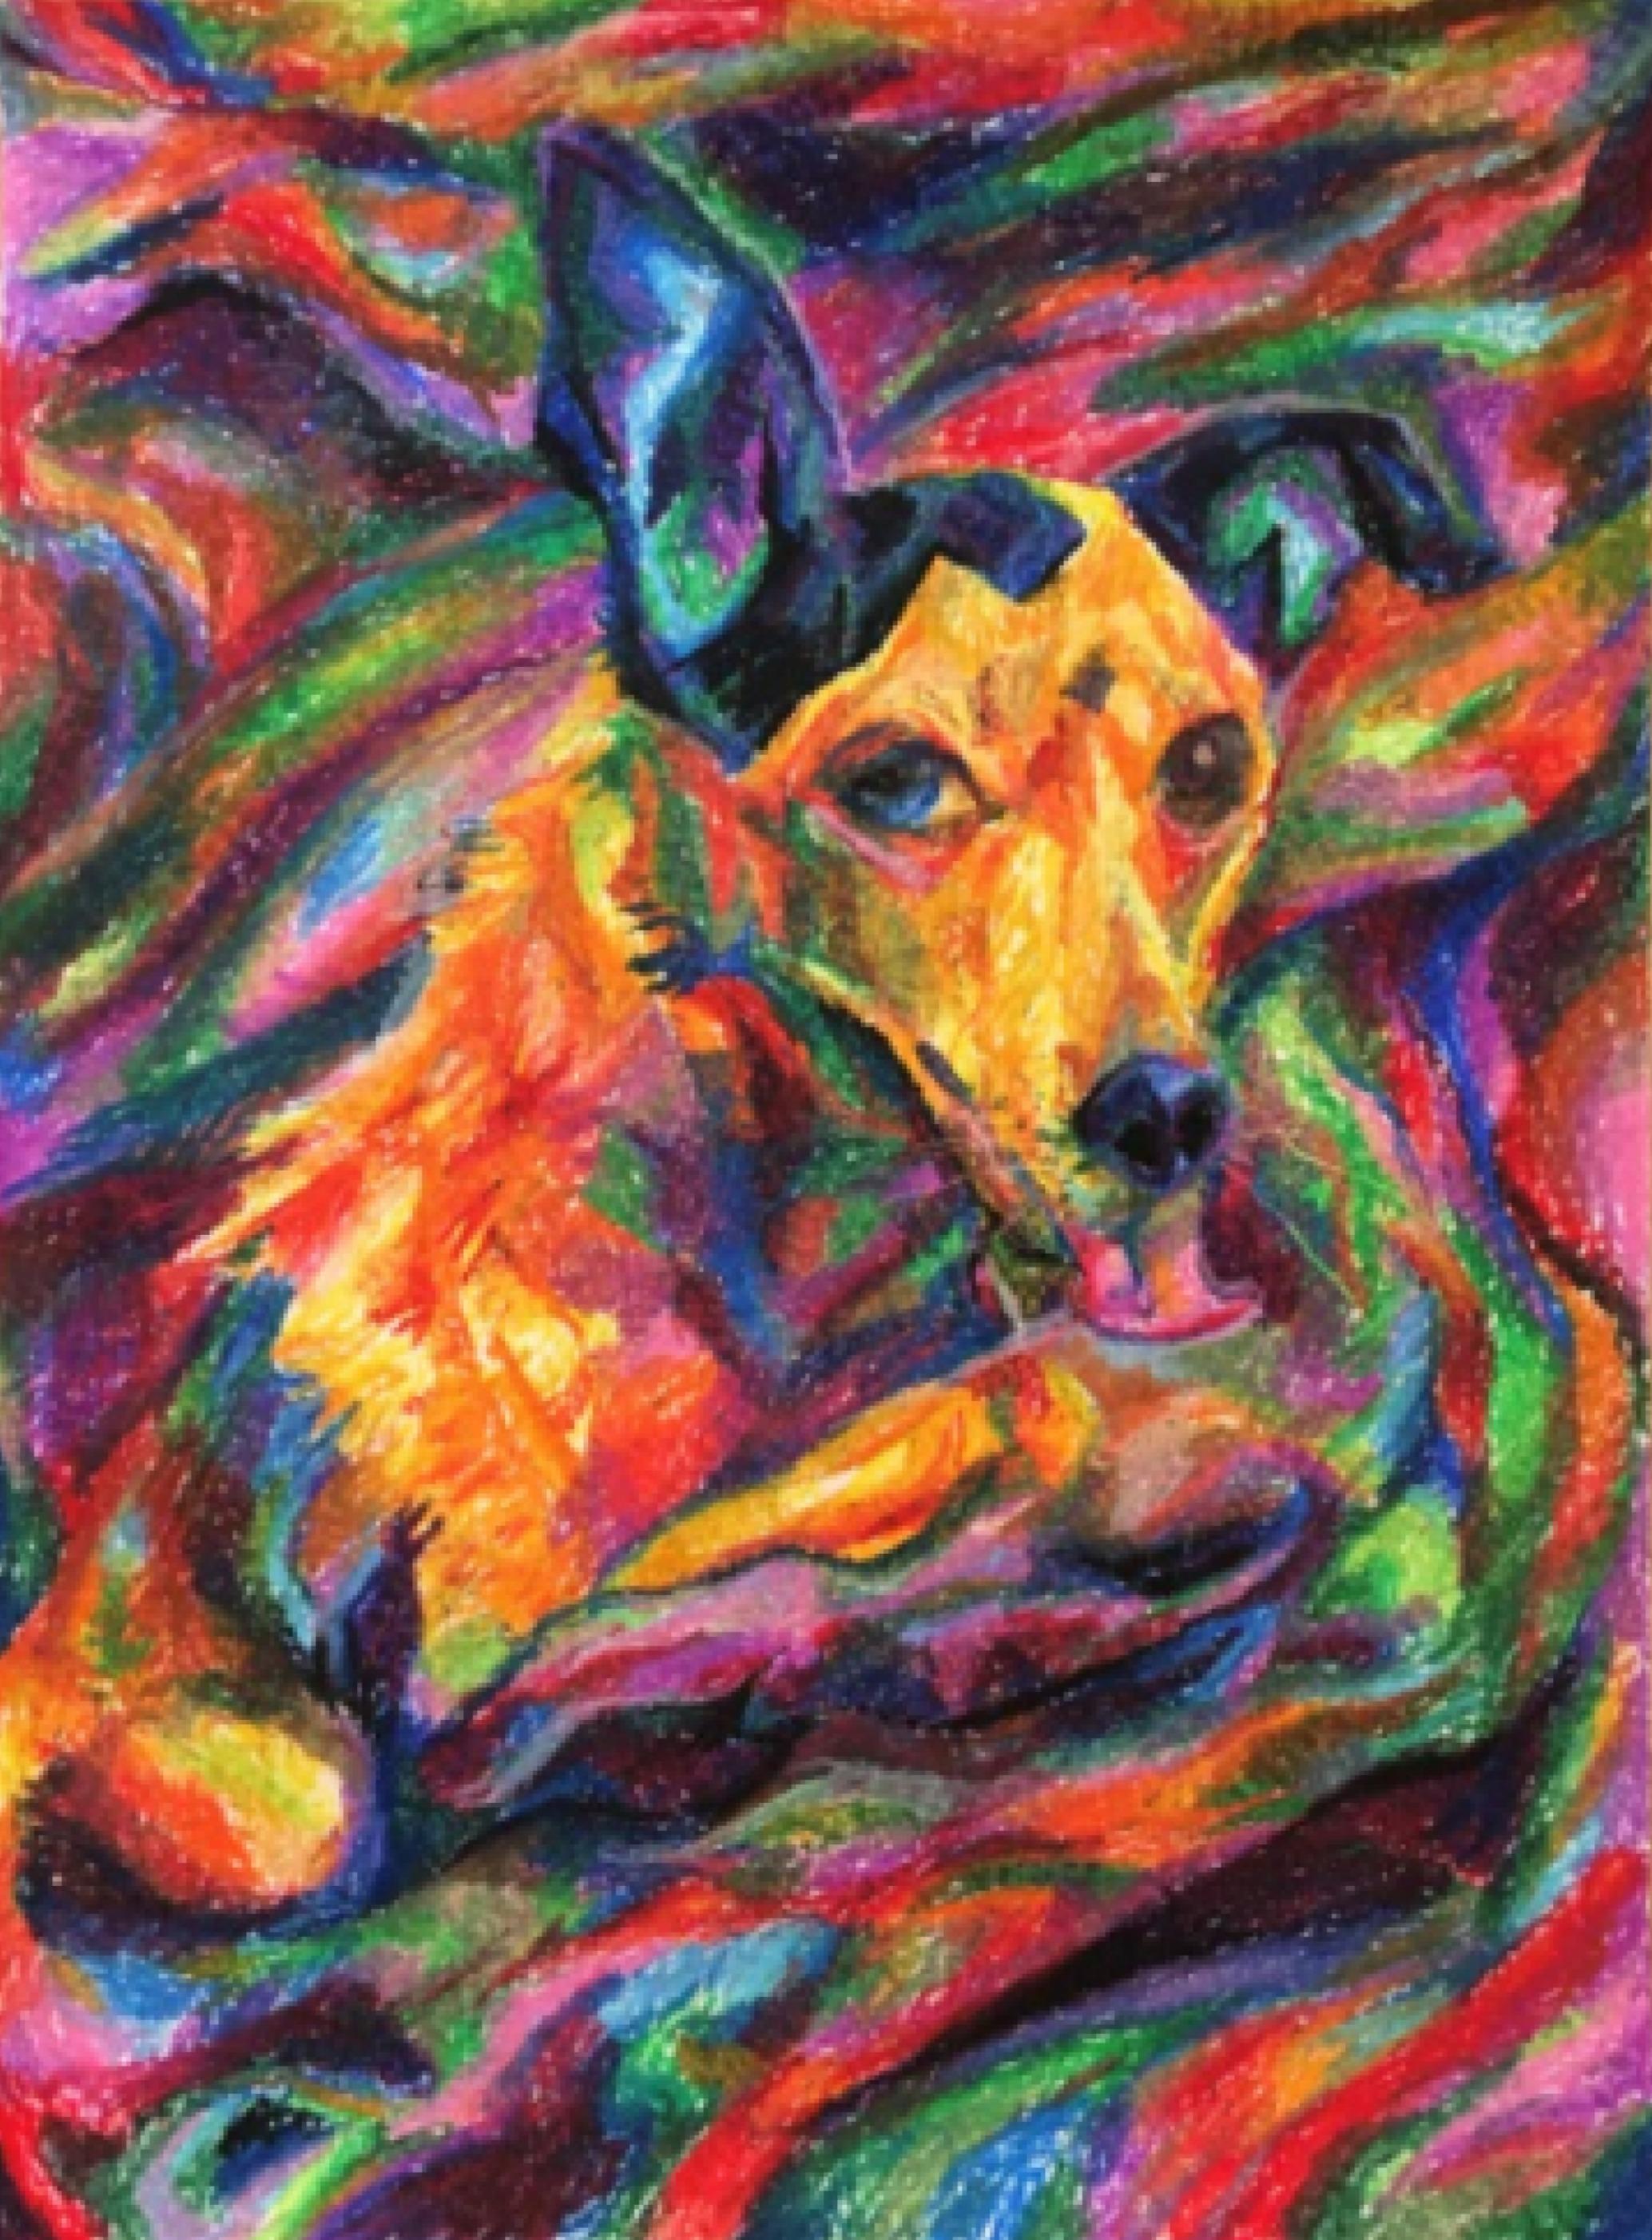 "47. ARRIANNE JANELLE ORTEGA  ""My dog stole my blanket"""